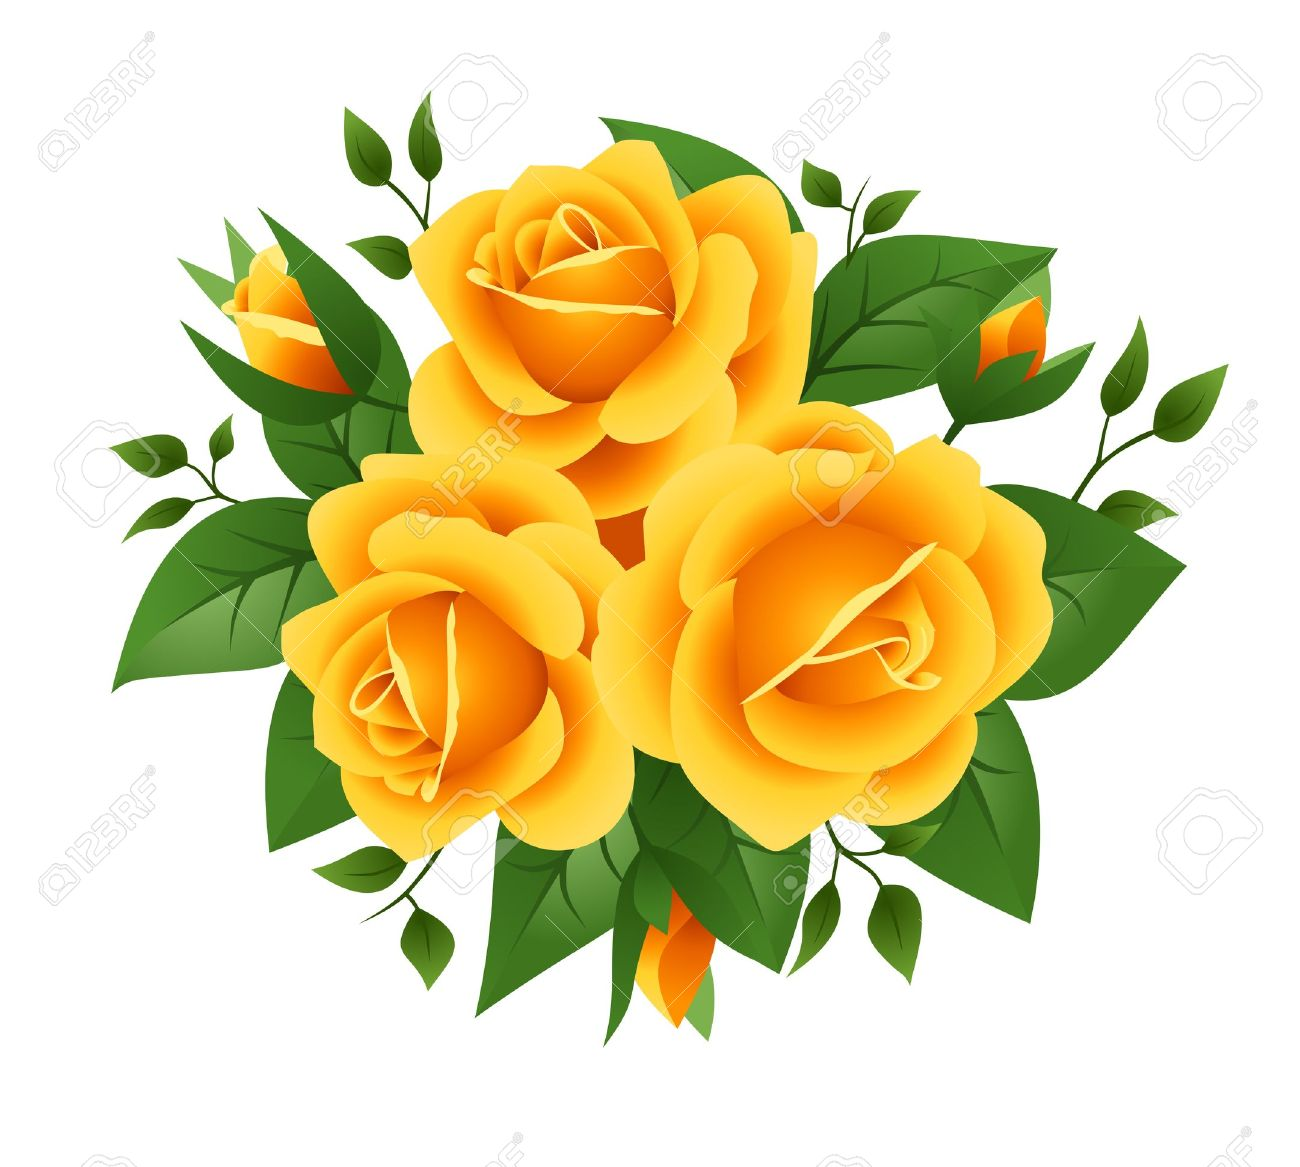 Three Yellow Roses Vector Illustration Royalty Free Cliparts